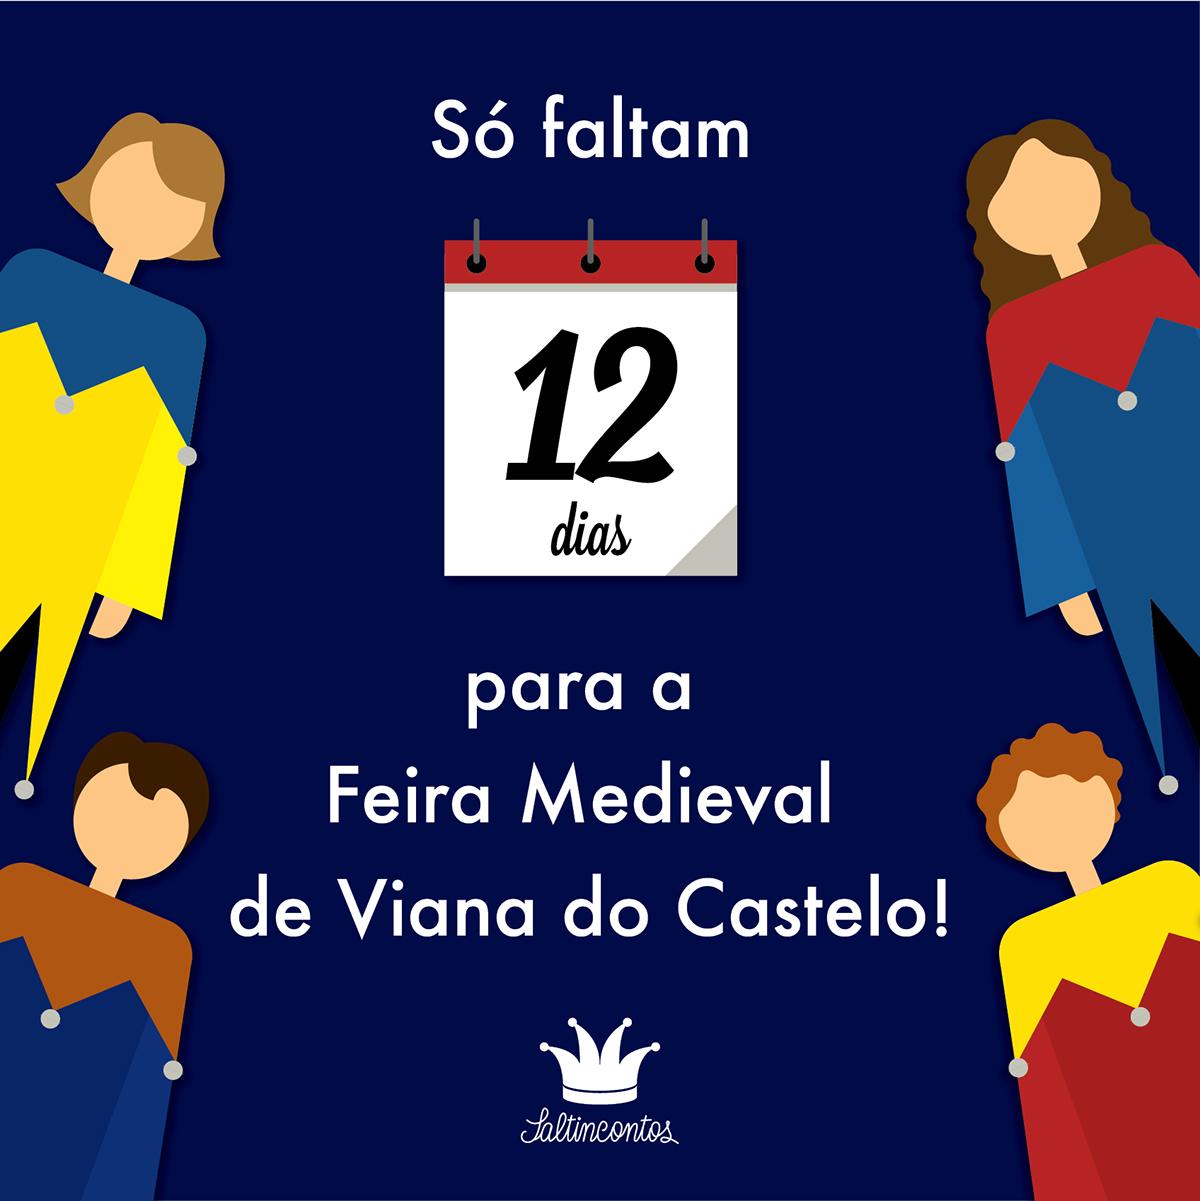 saltincontos LIVROS book daily counting dragon Princess team group medieval knight adventure story Fair personalized